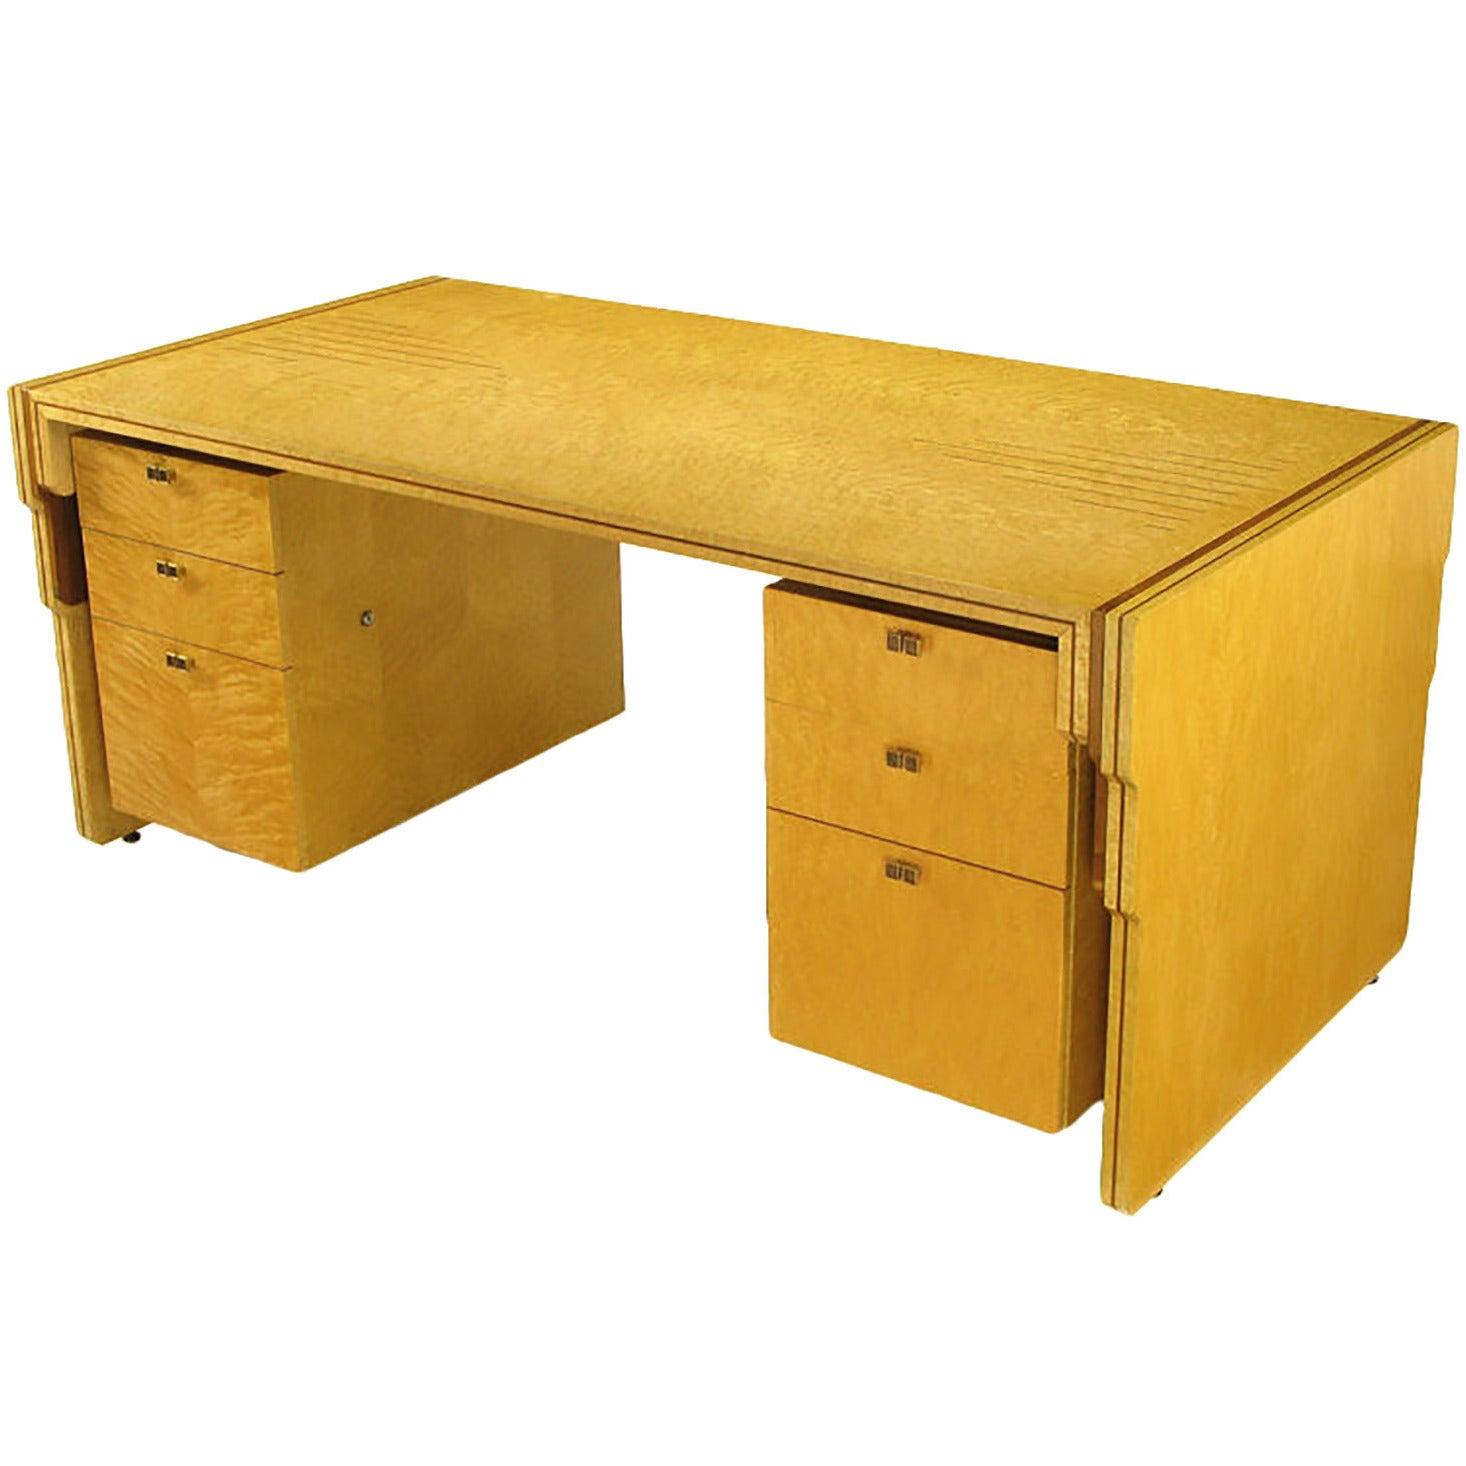 Pierre Paulin Bird's-Eye Maple and Walnut Inlay Executive Desk